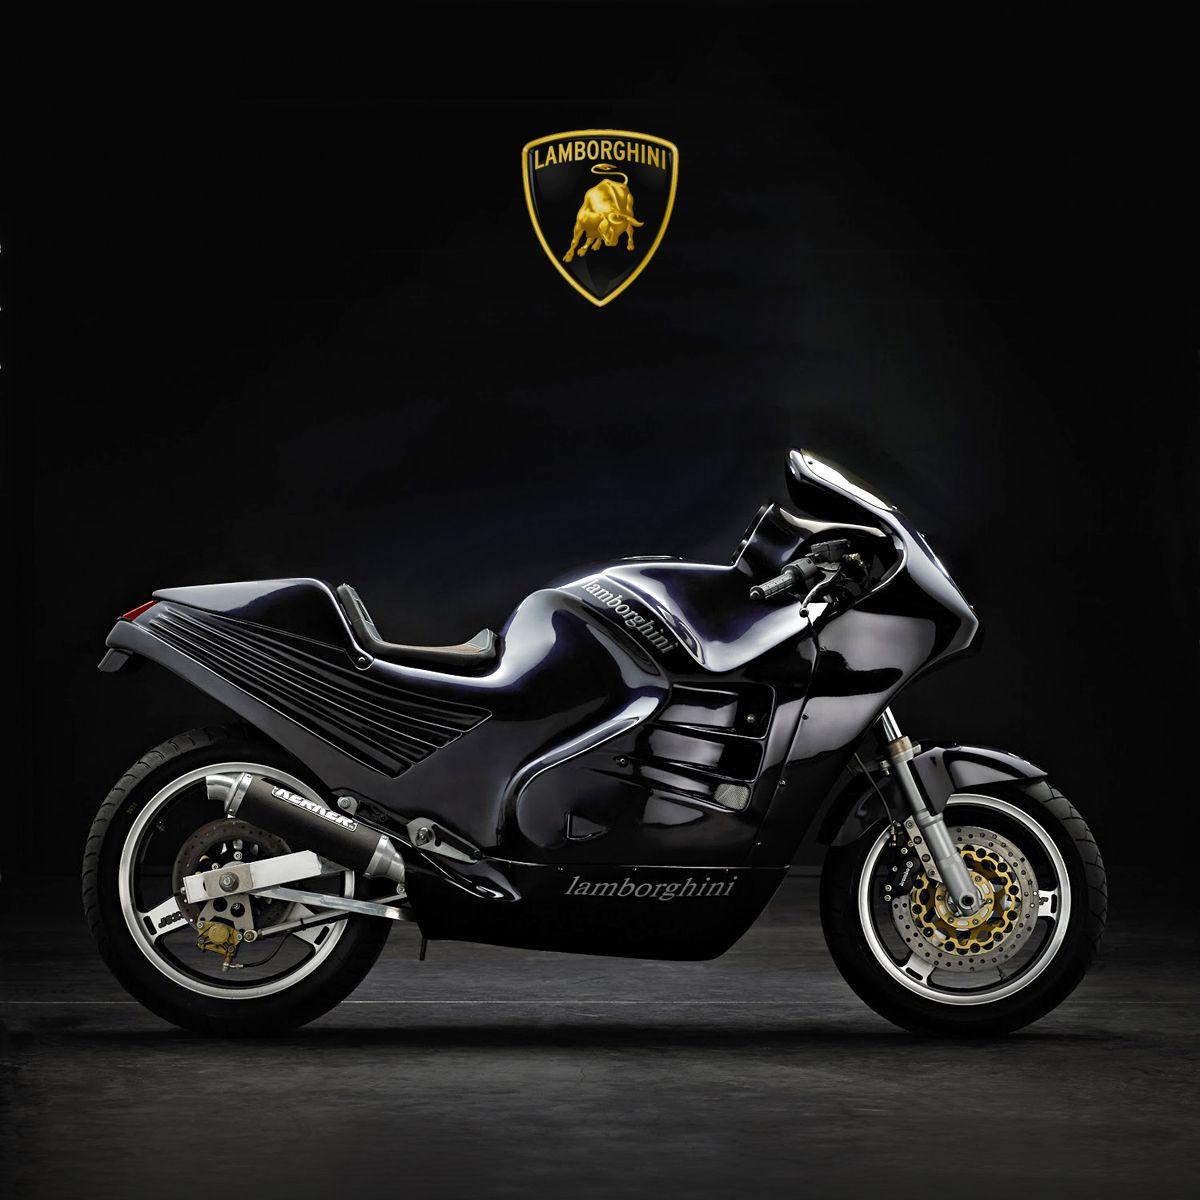 Lamborghini Motorcycle: Lamborghini Sport Bike